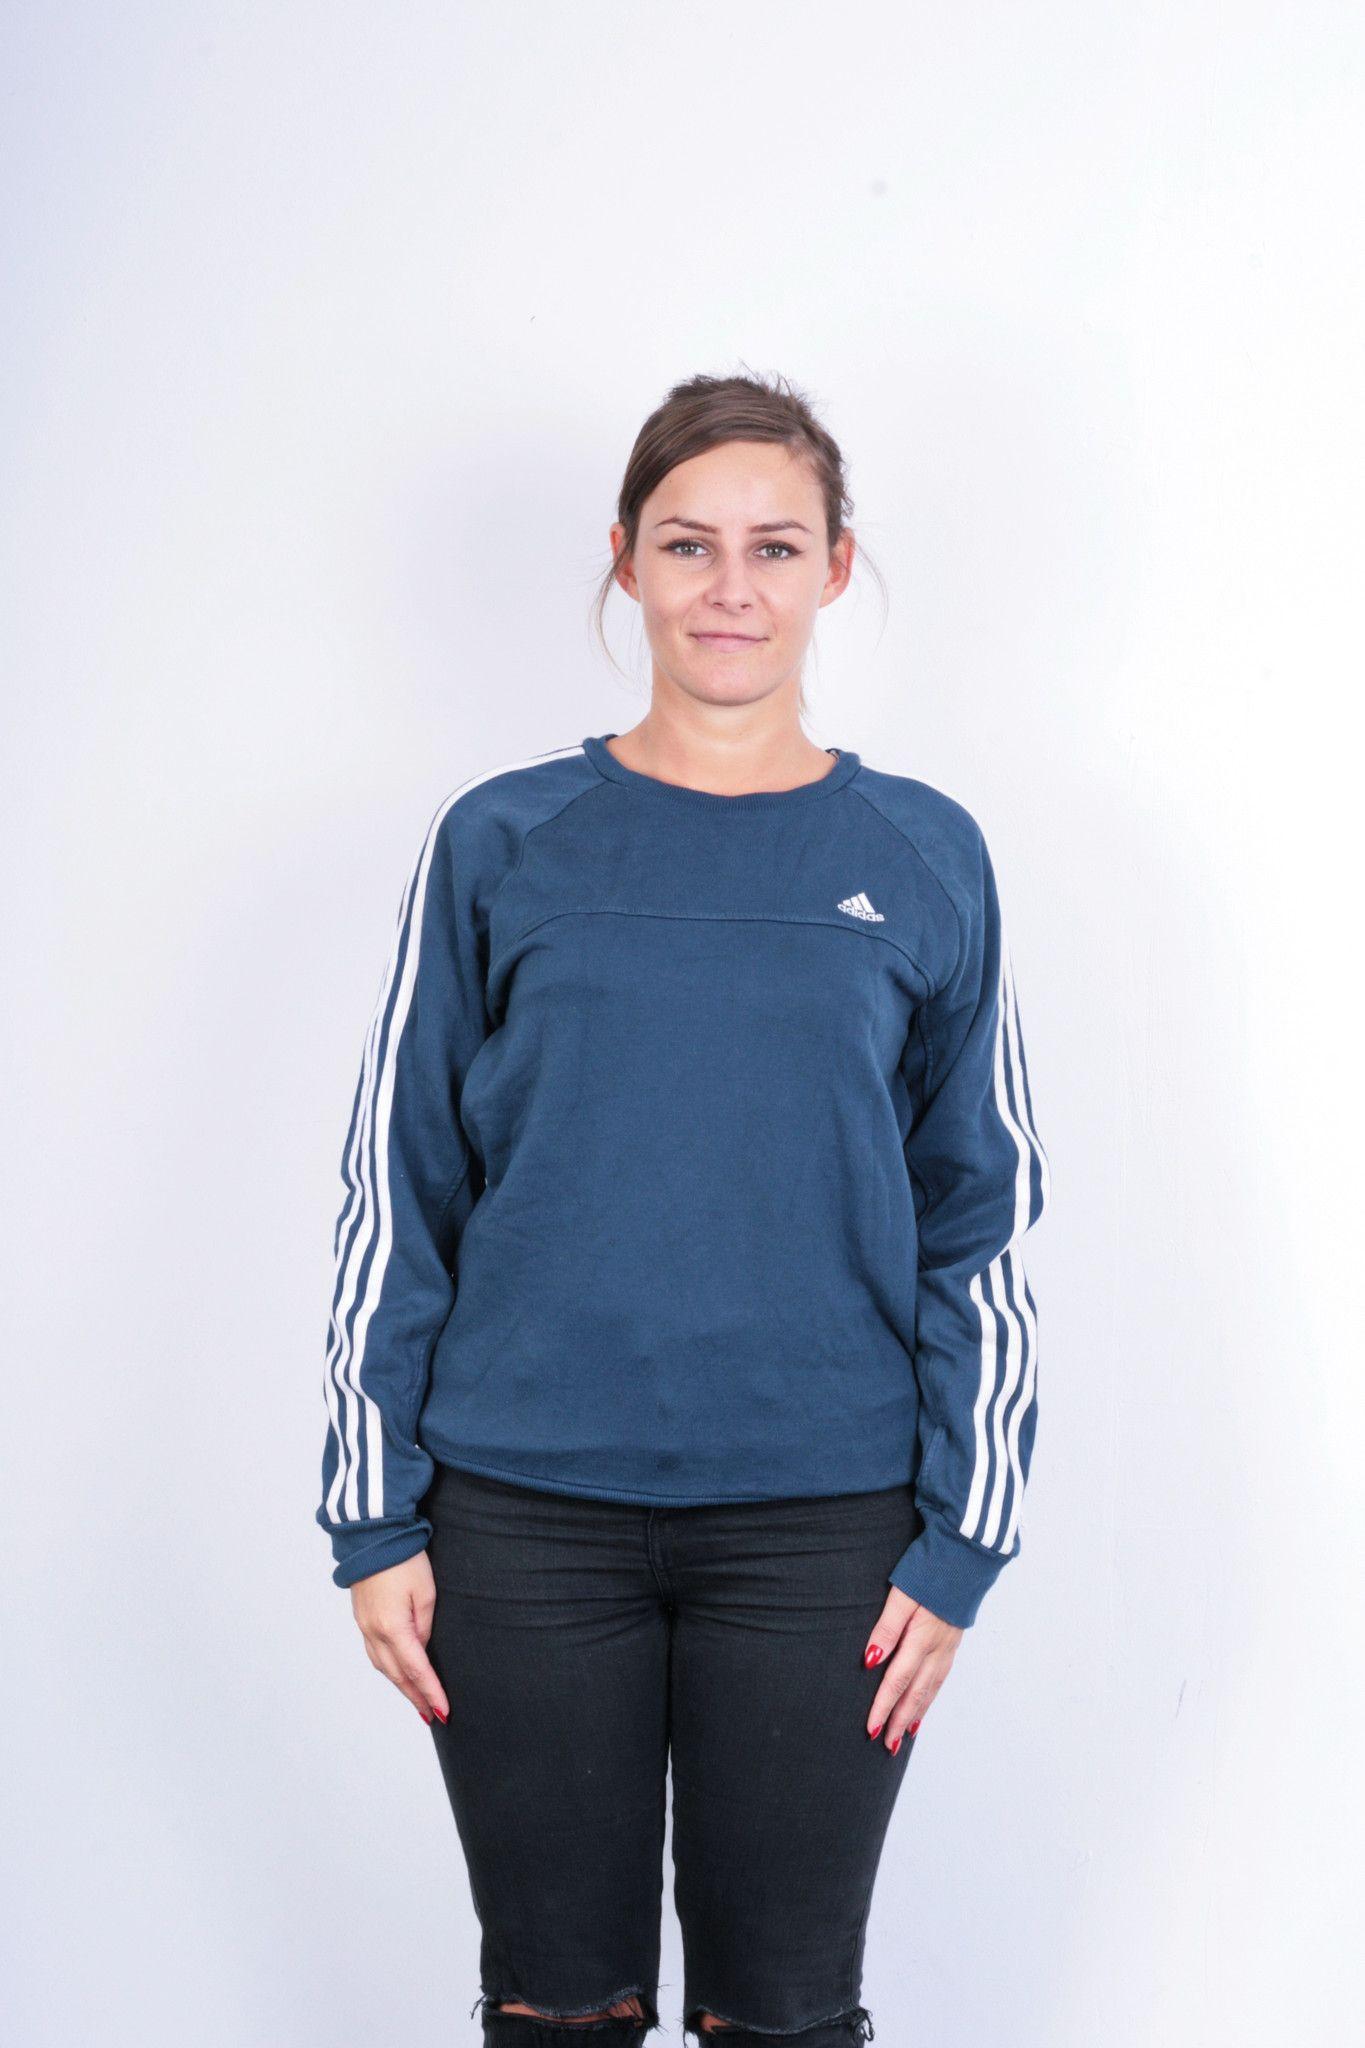 Adidas Womens S/M Sweatshirt Crew Neck Navy Blue Cotton Top ...